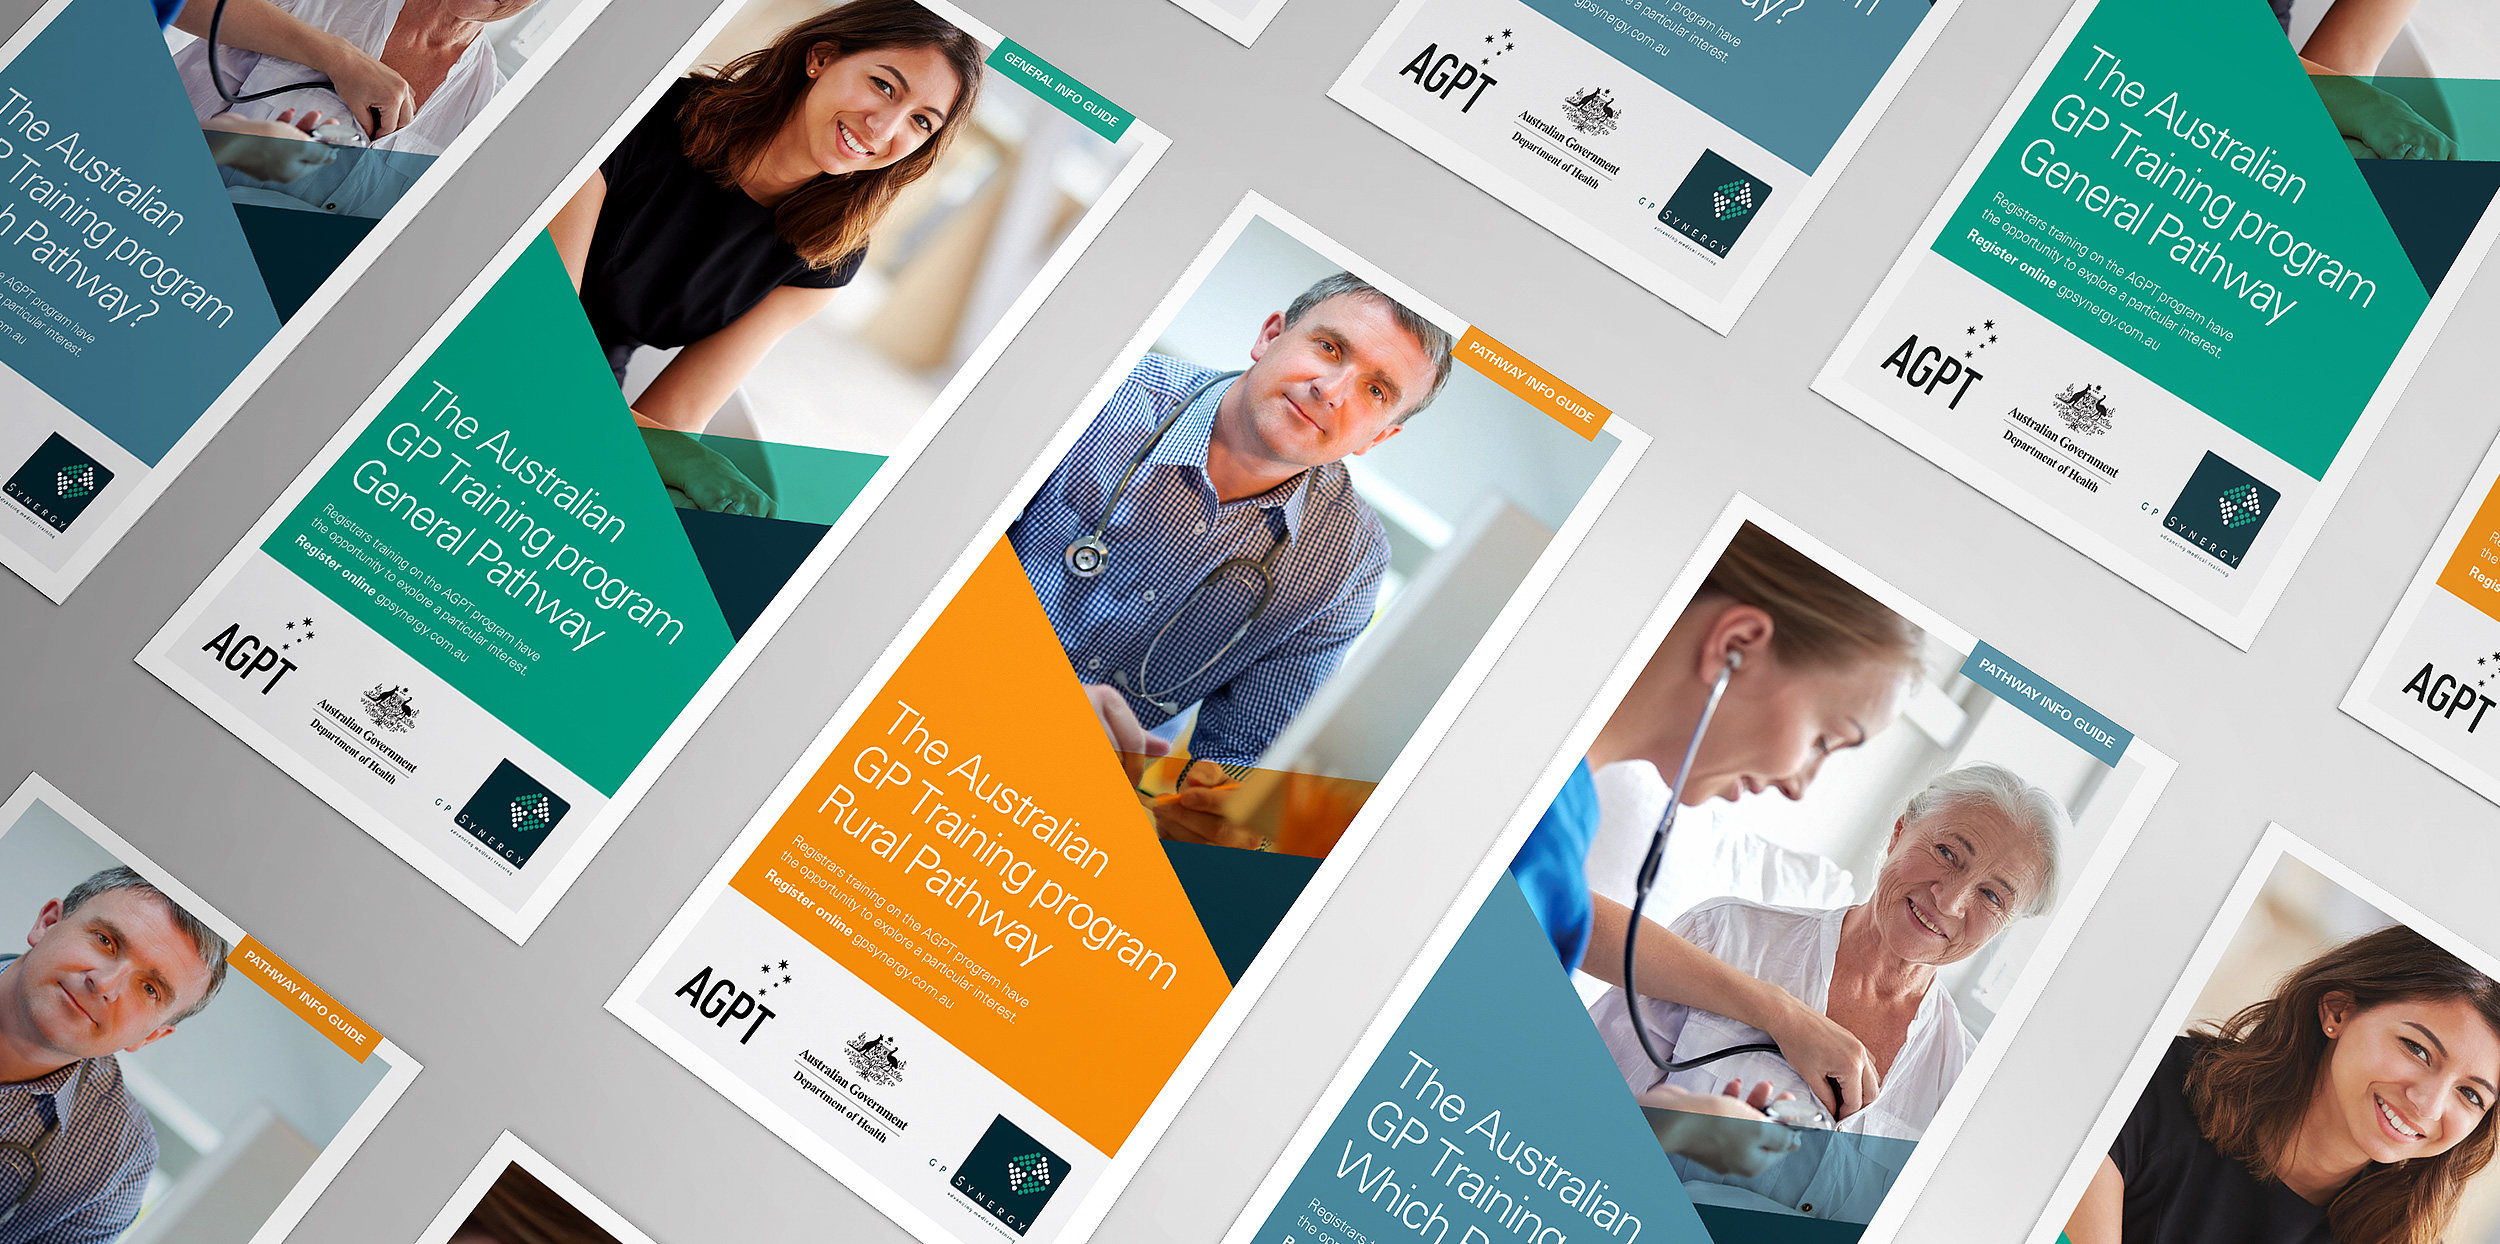 Handle-Sydney-Branding_Guidelines_Branding-GP-Synergy_02.jpg